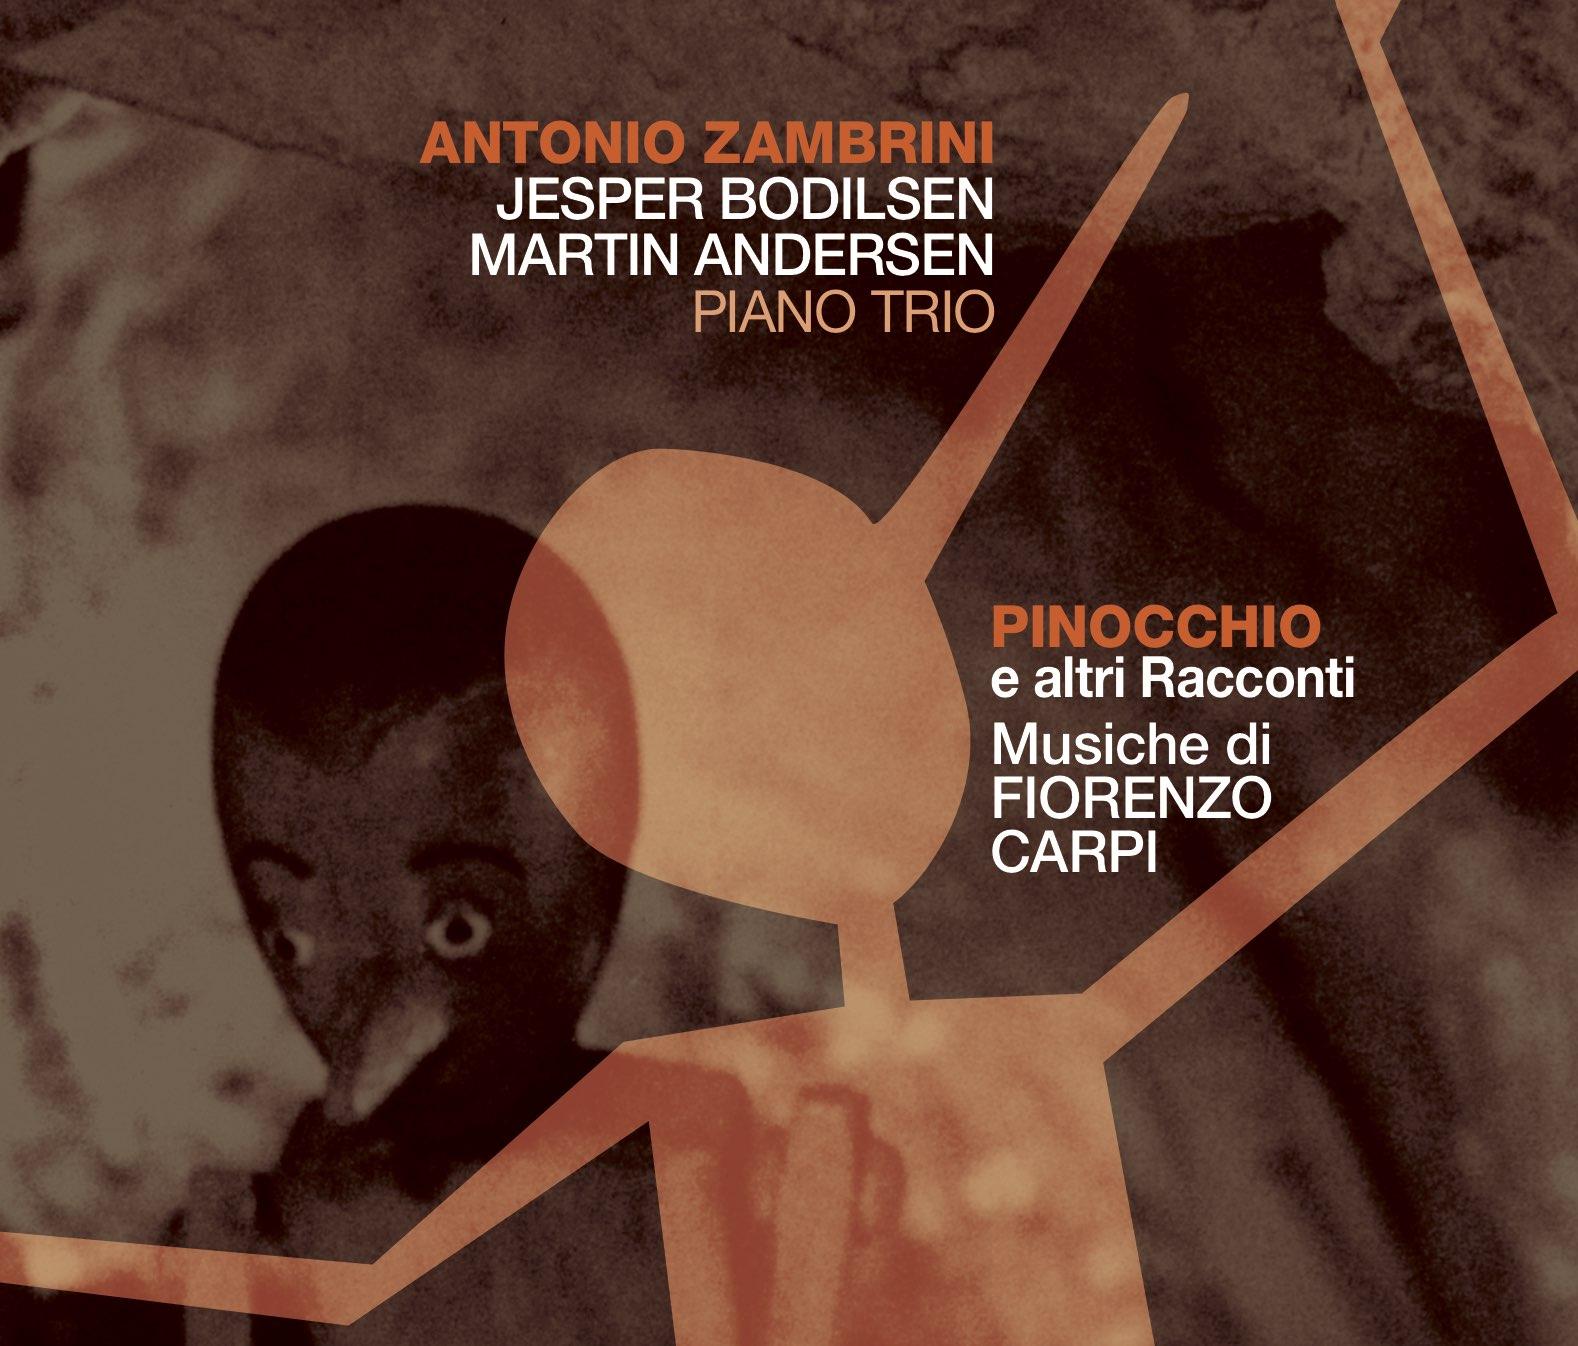 Copertina cd -Zambrini.jpg